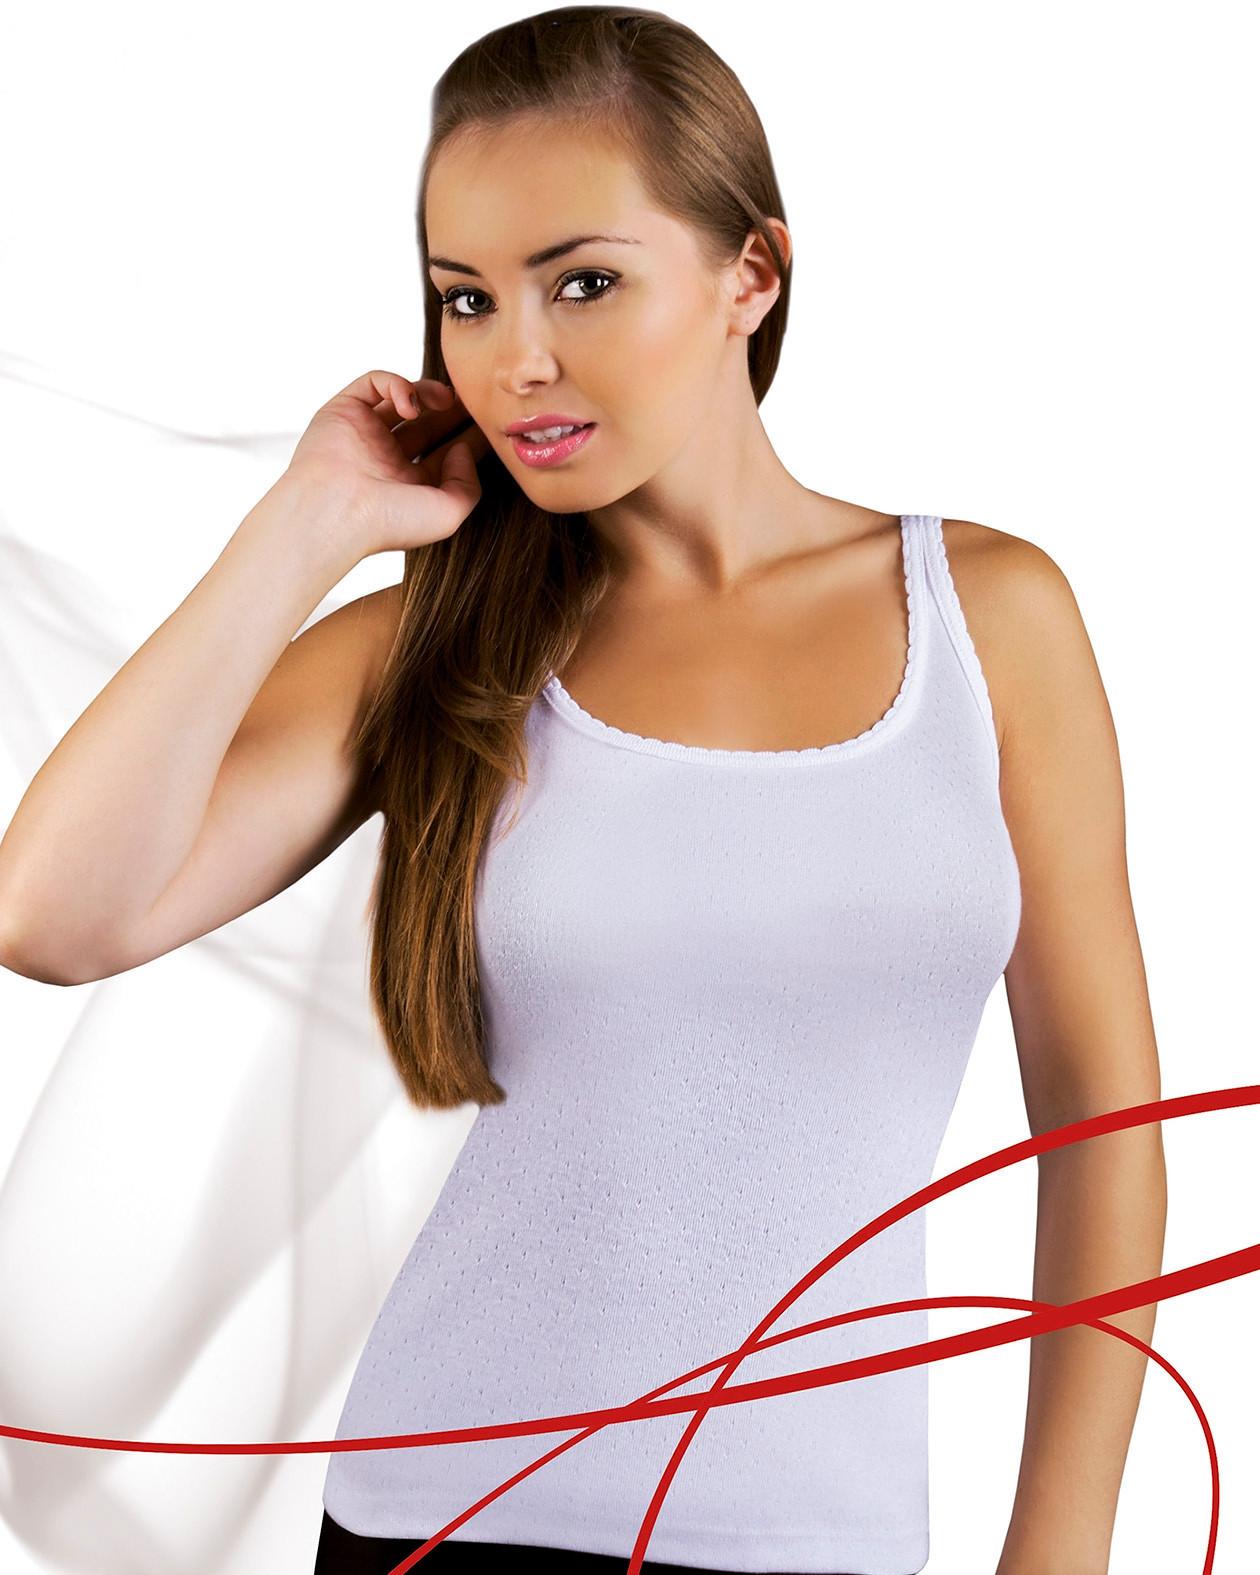 Dámská košilka Emili Mania S-XL bílá bílá XL